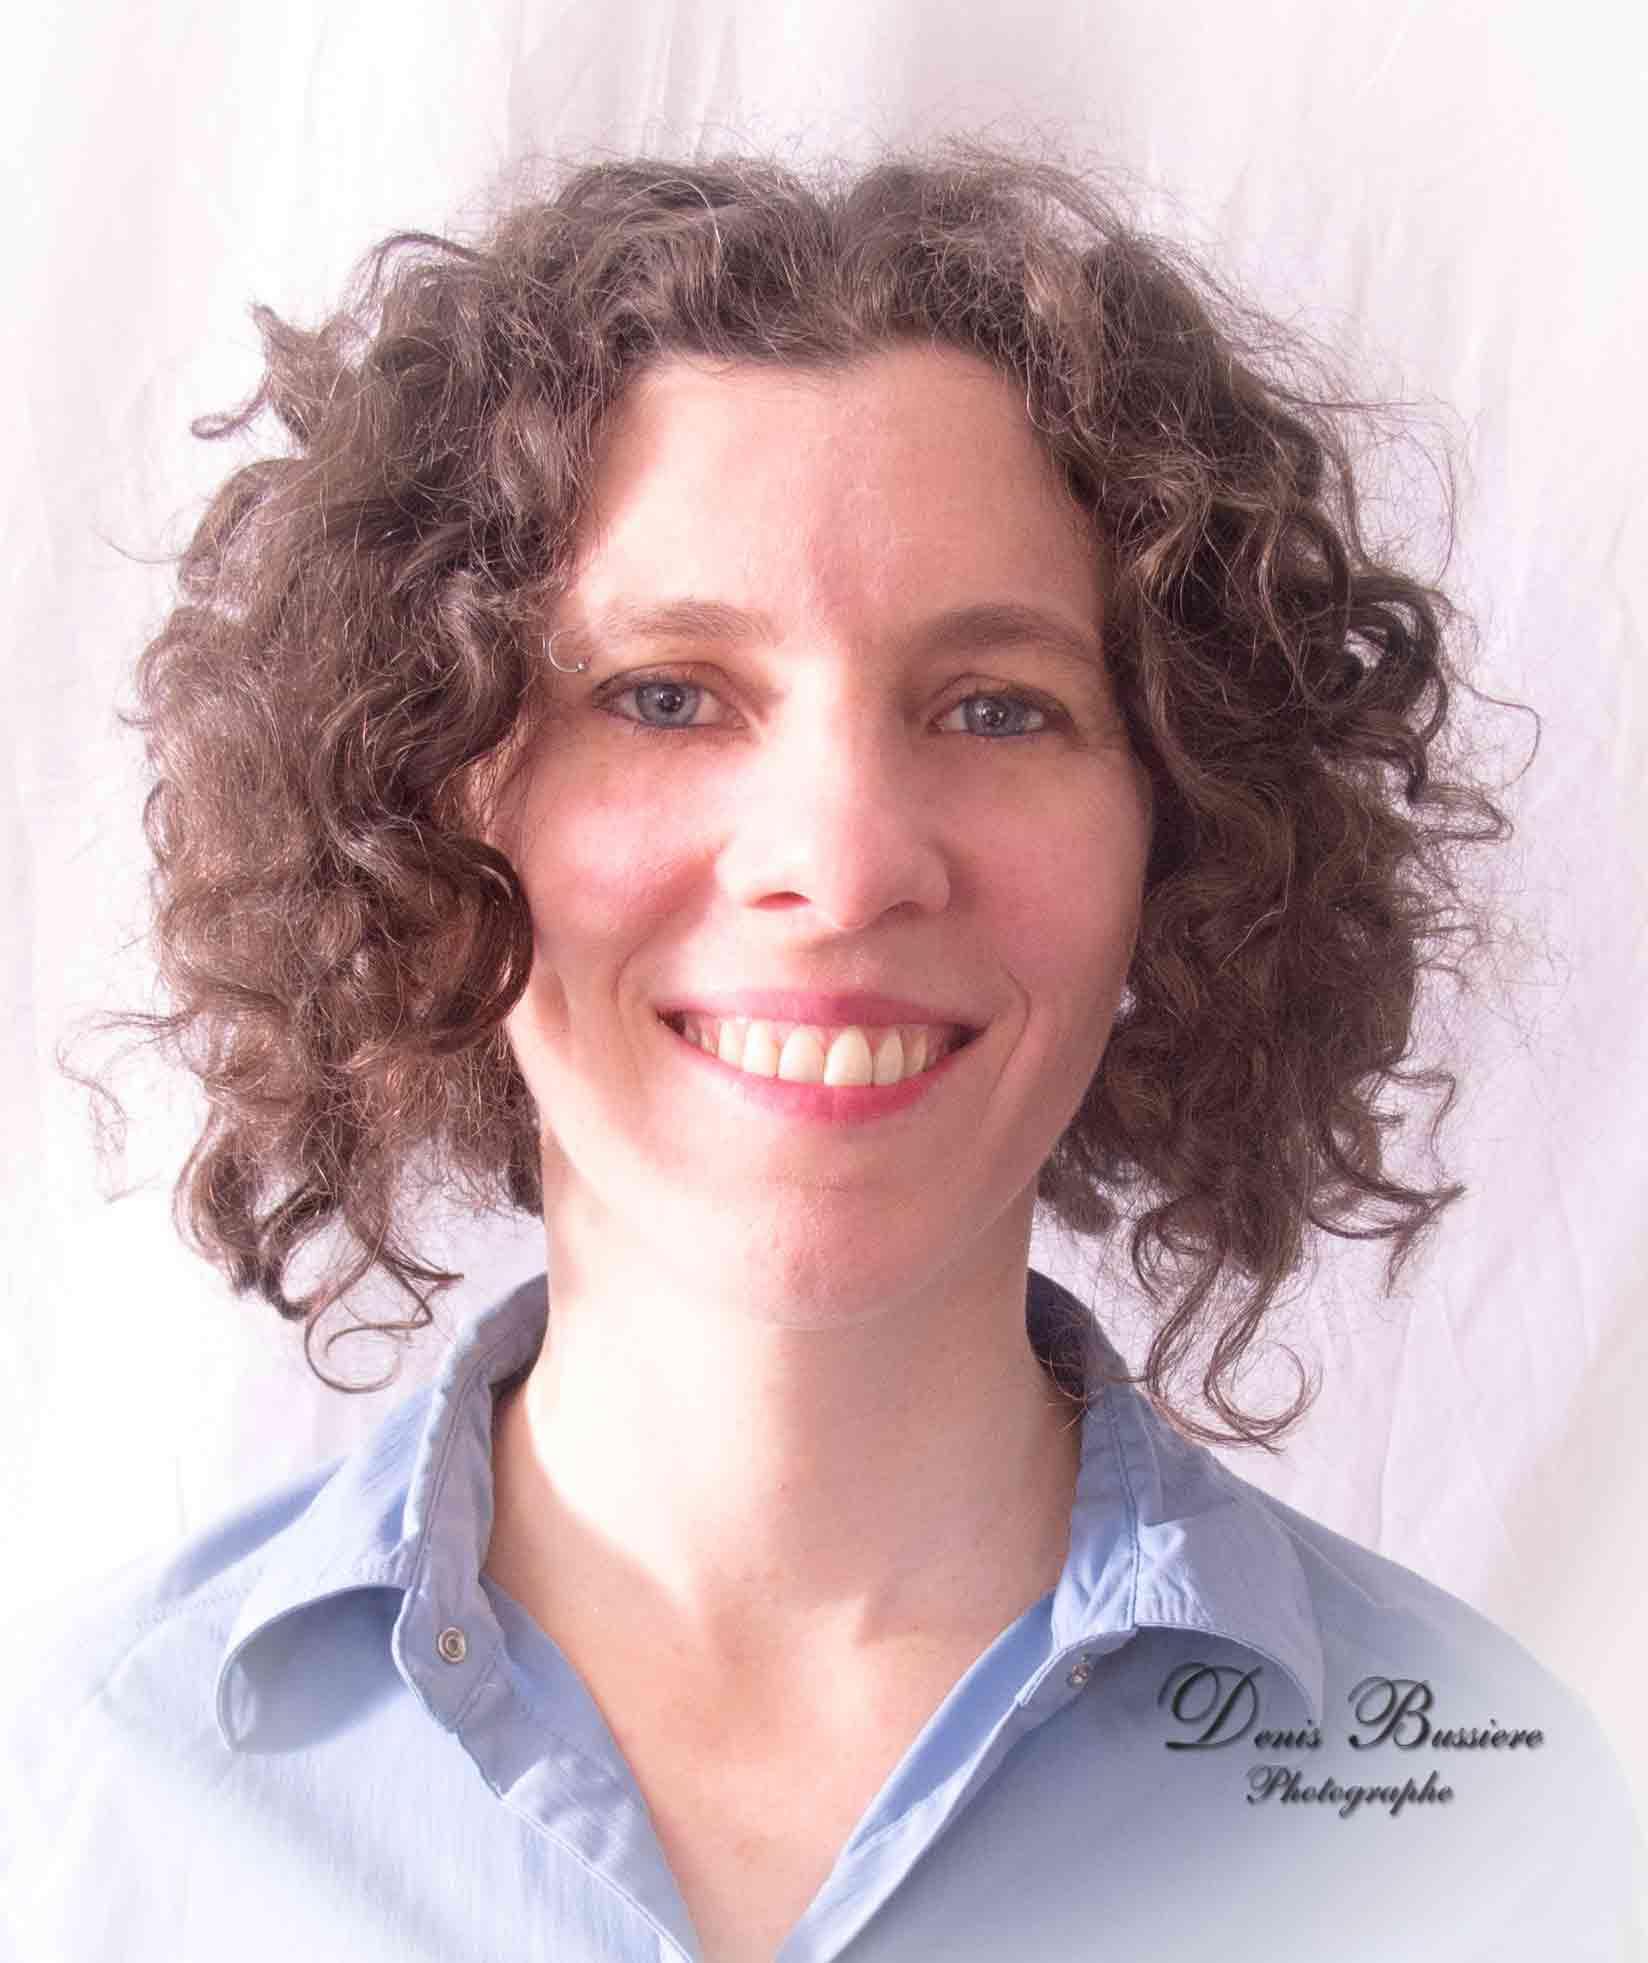 Marie-Soleil Pilette, ostéopathe I.O.